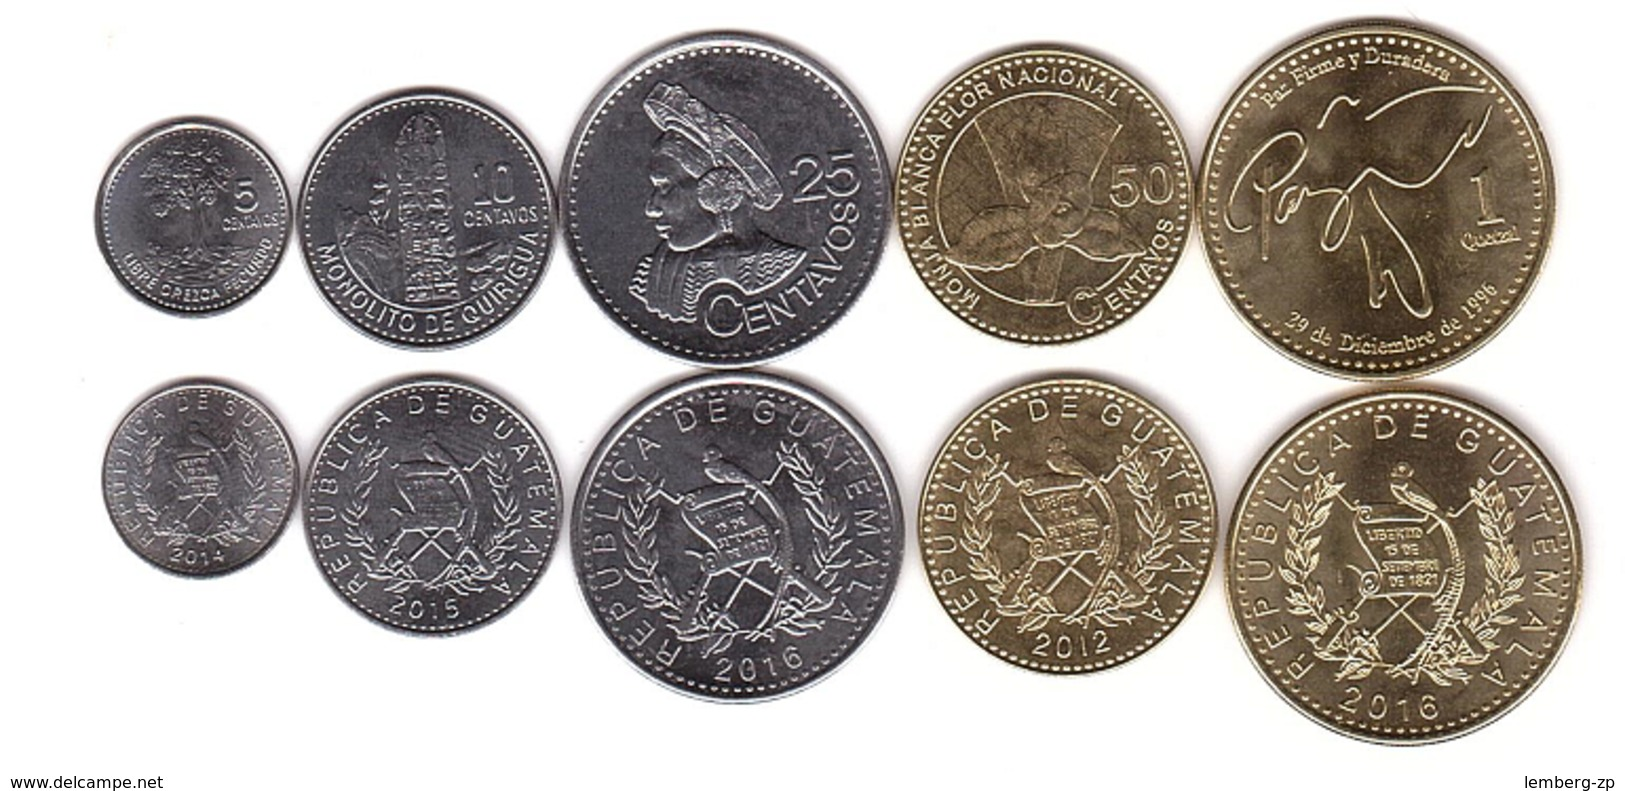 Guatemala - Set 5 Coins 5 10 25 50 Centavos 1 Quetzal 2012 - 2016 UNC Lemberg-Zp - Guatemala